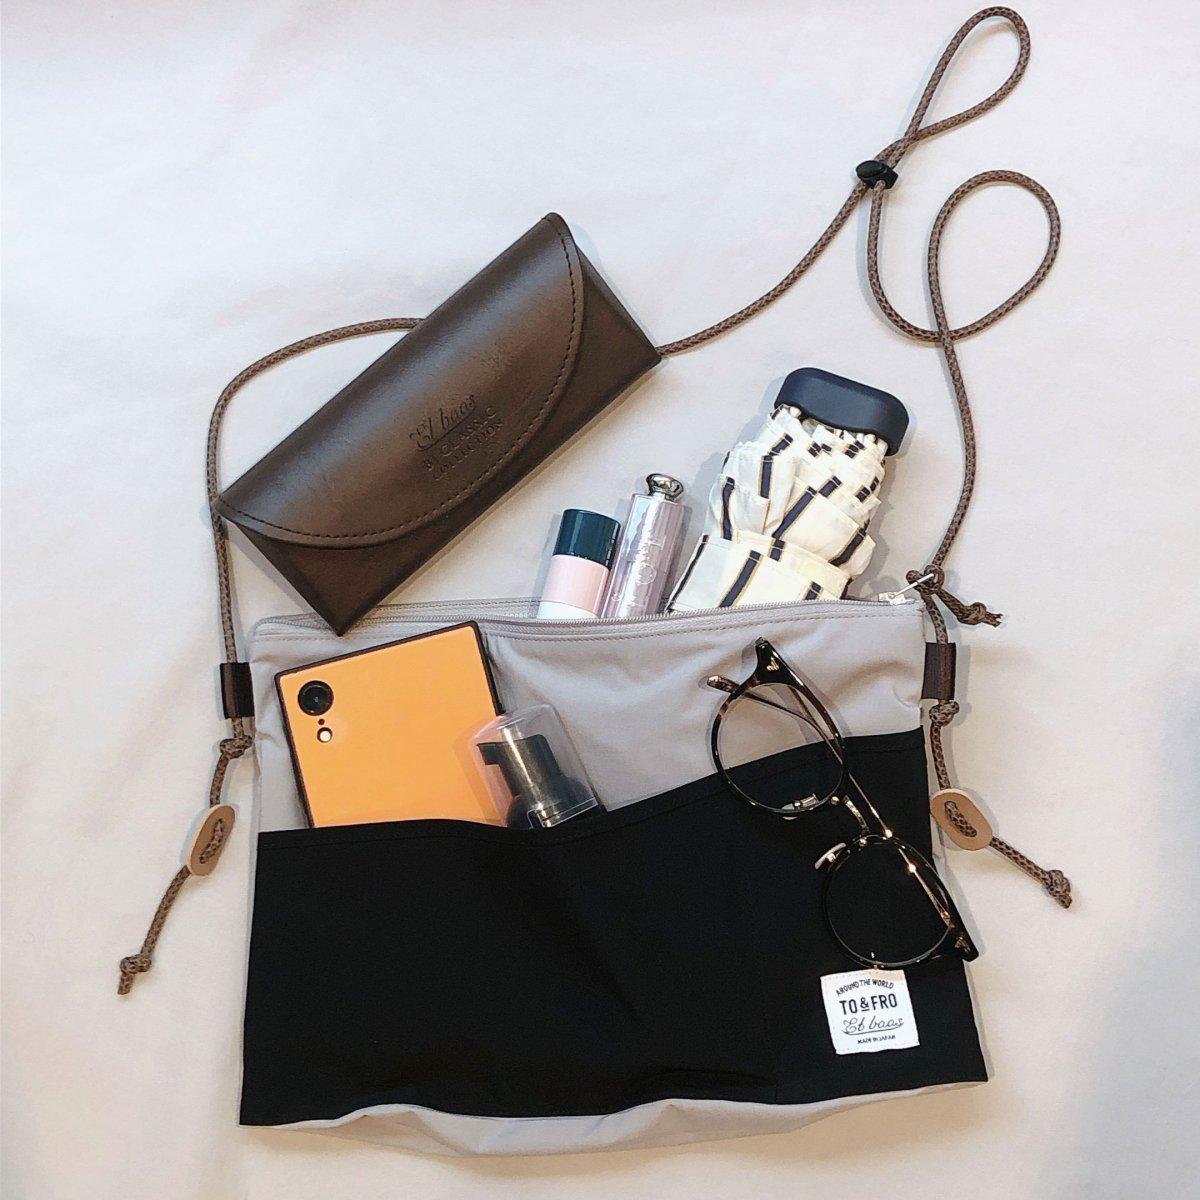 SACOCHE bag(Et baas x TO&FRO) 詳細画像3